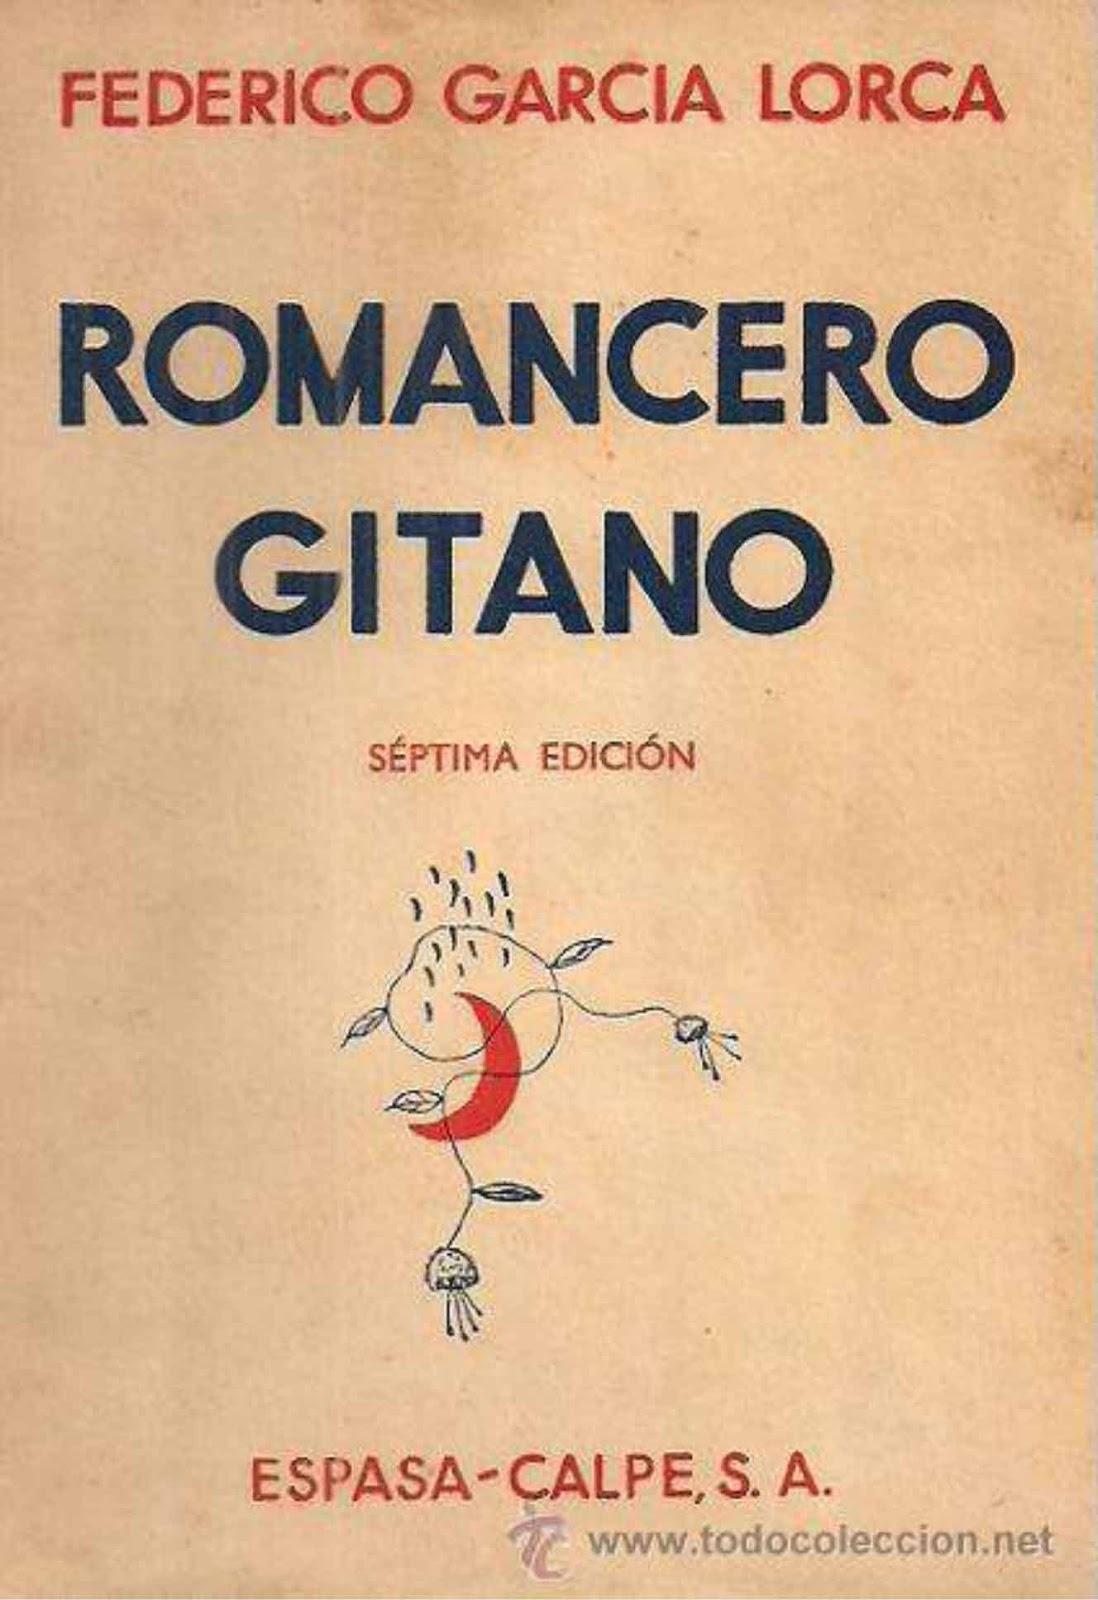 Resultado de imagen para romancero gitano edición 1932